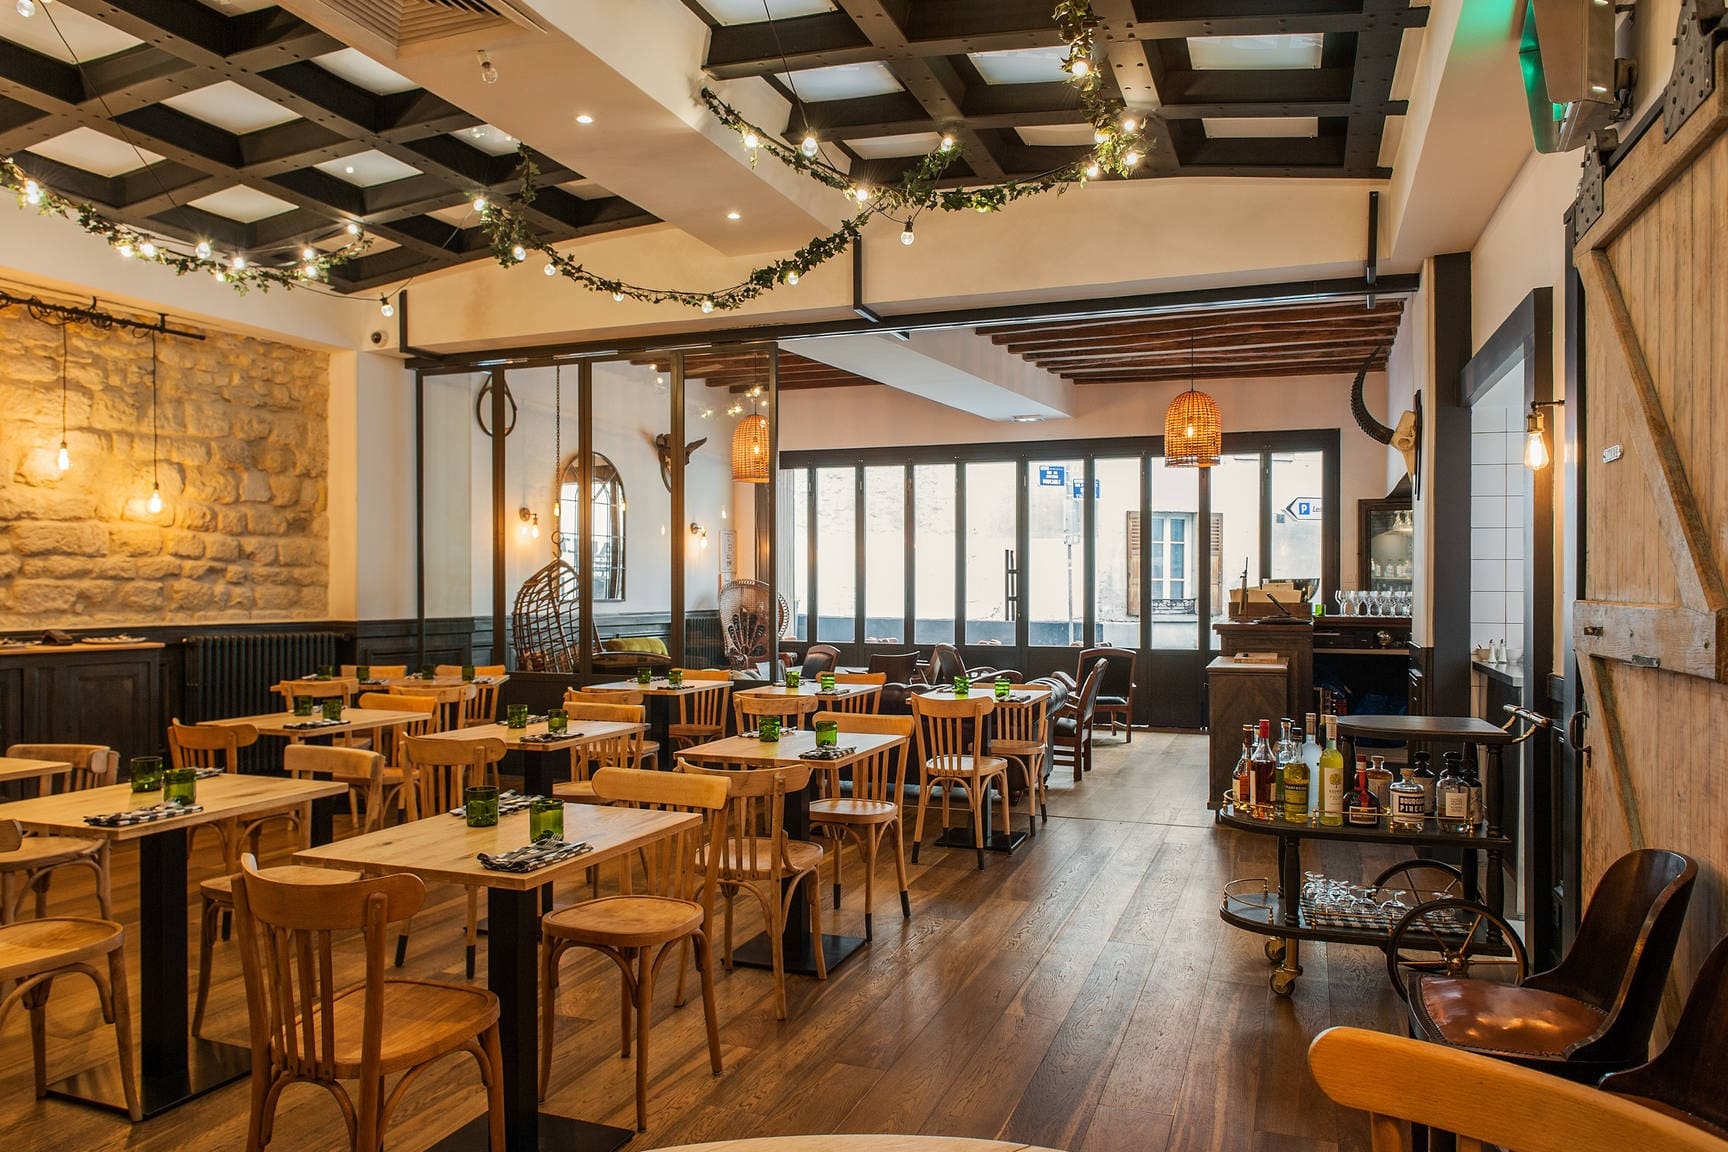 cabane-restaurant-nanterre-client-tiller